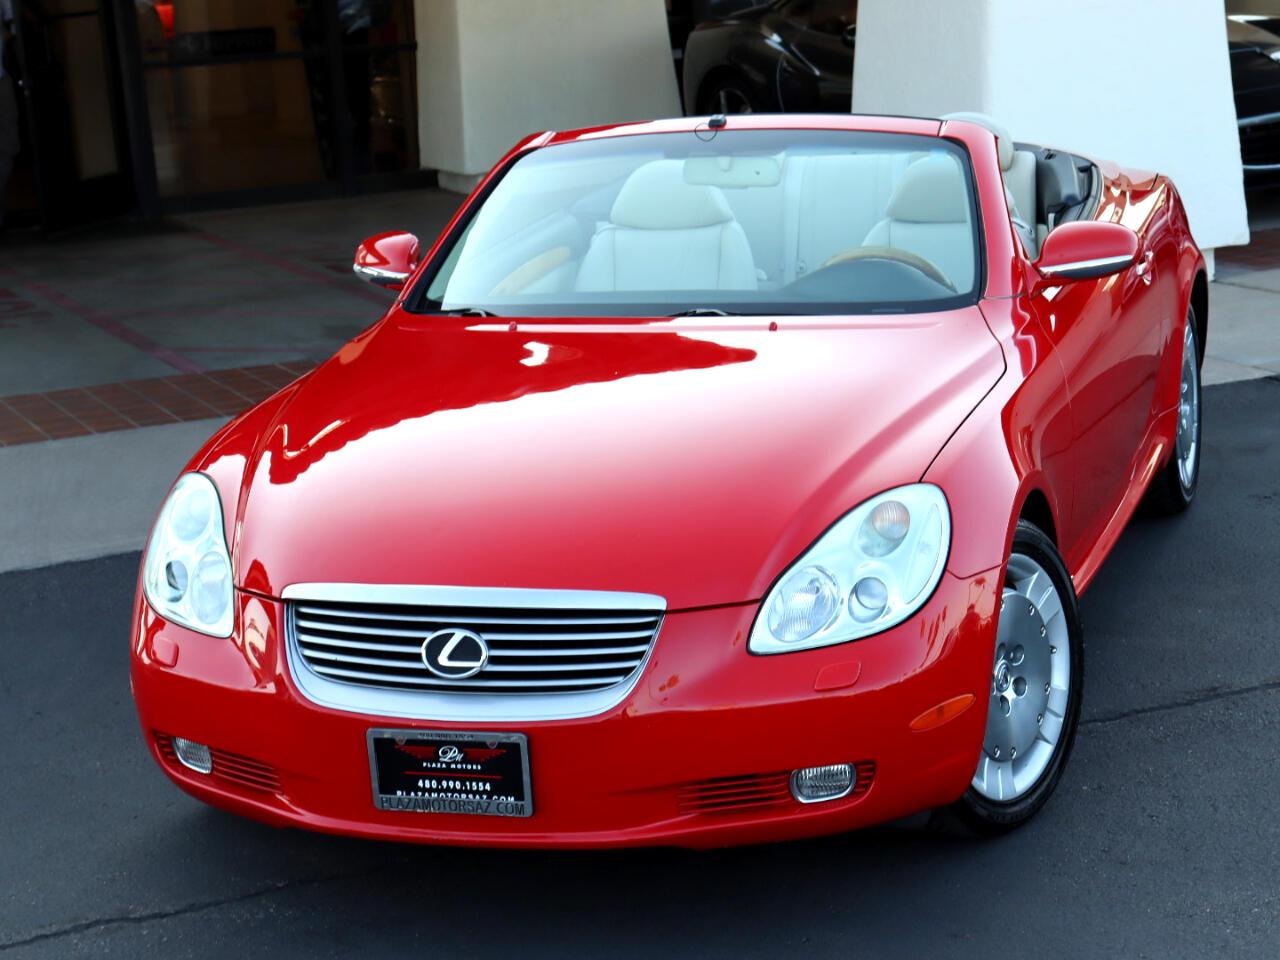 Lexus SC 430 Convertible 2005